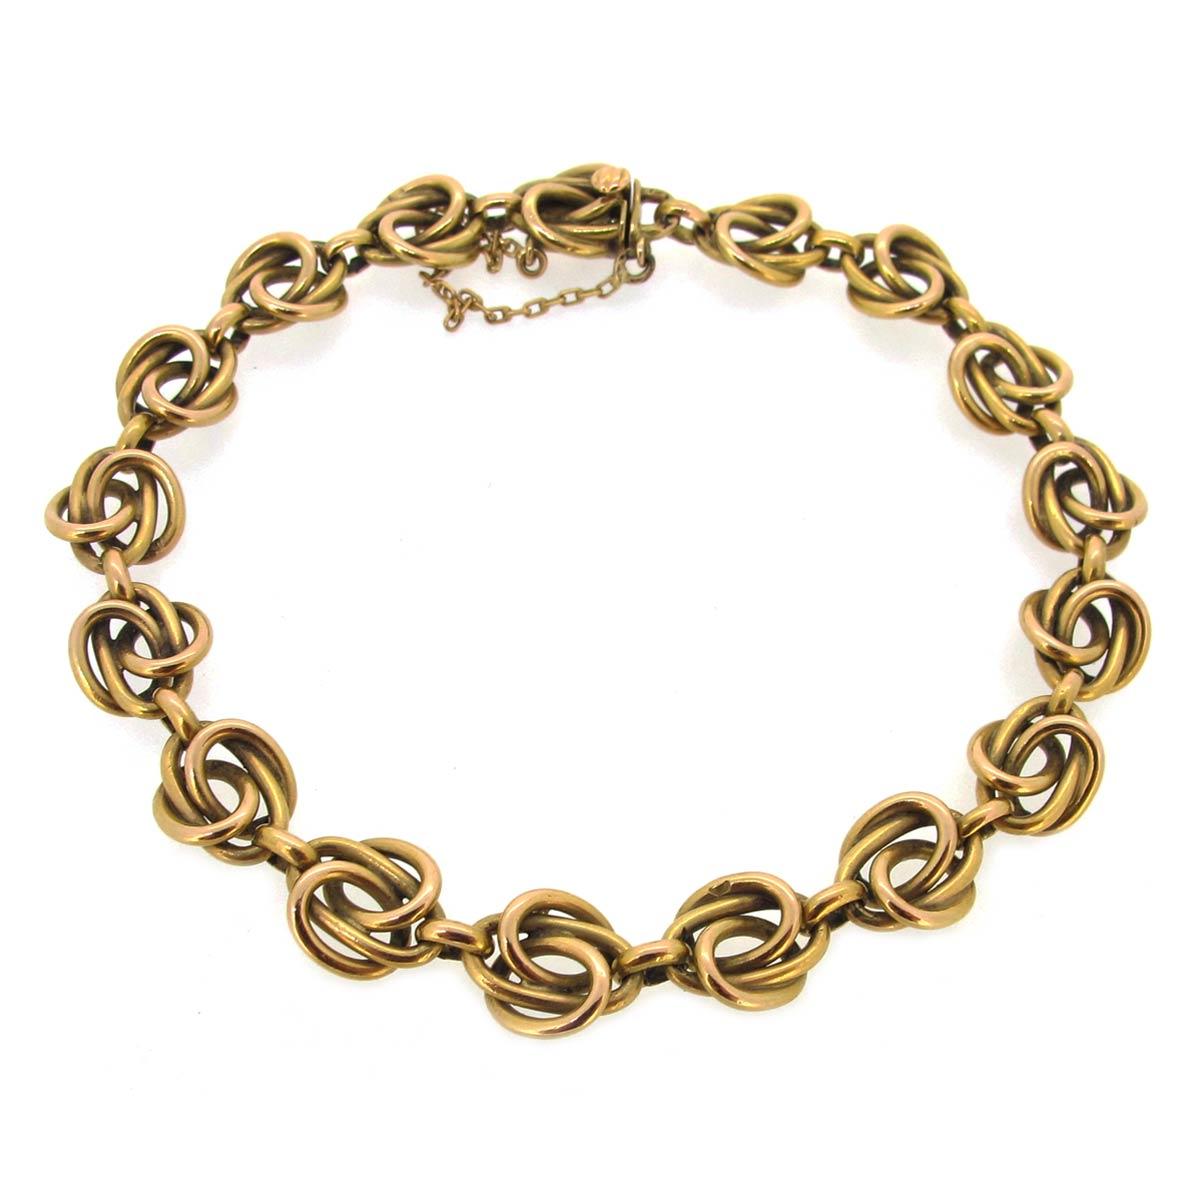 18ct Gold Bracelet